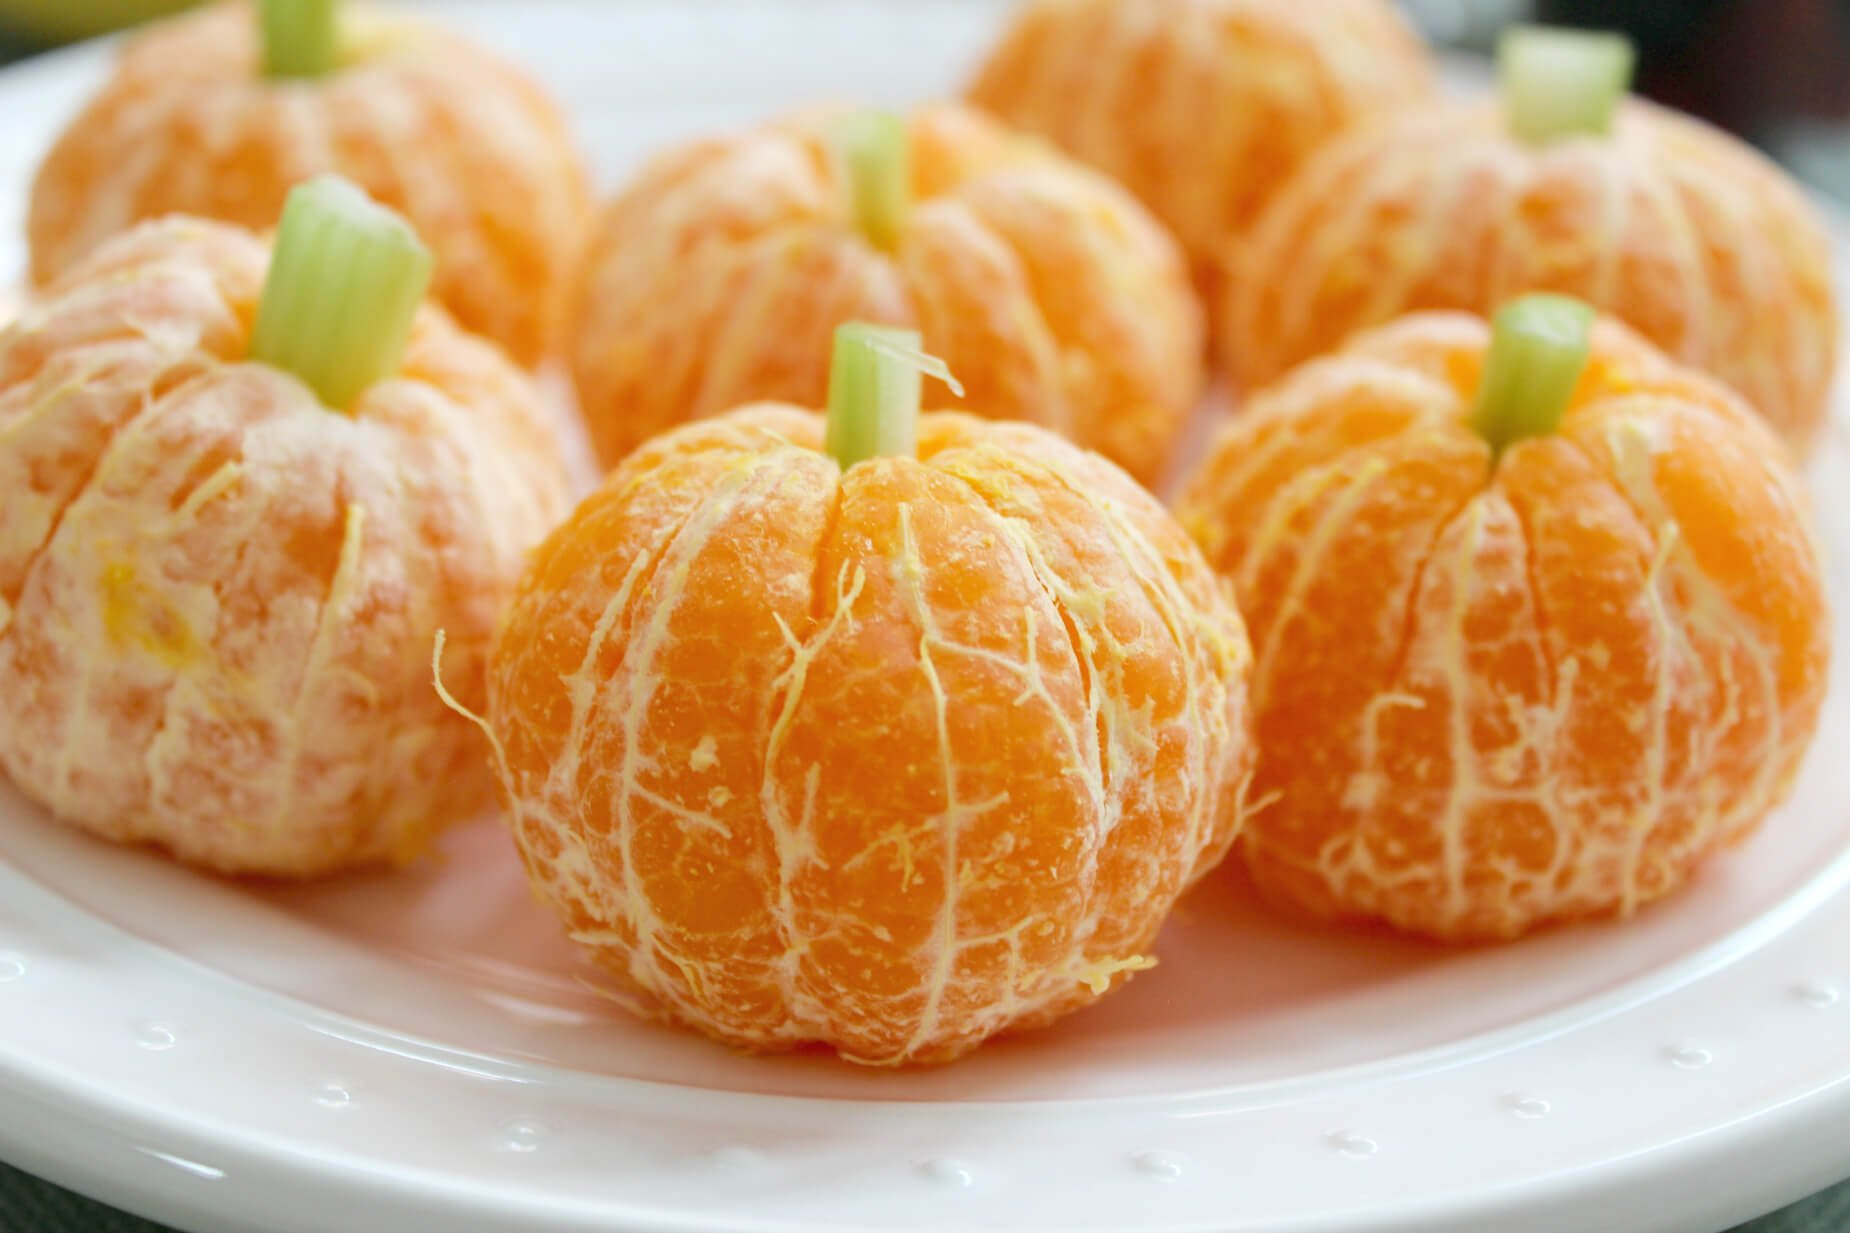 Friendly Clementine Pumpkins for Halloween